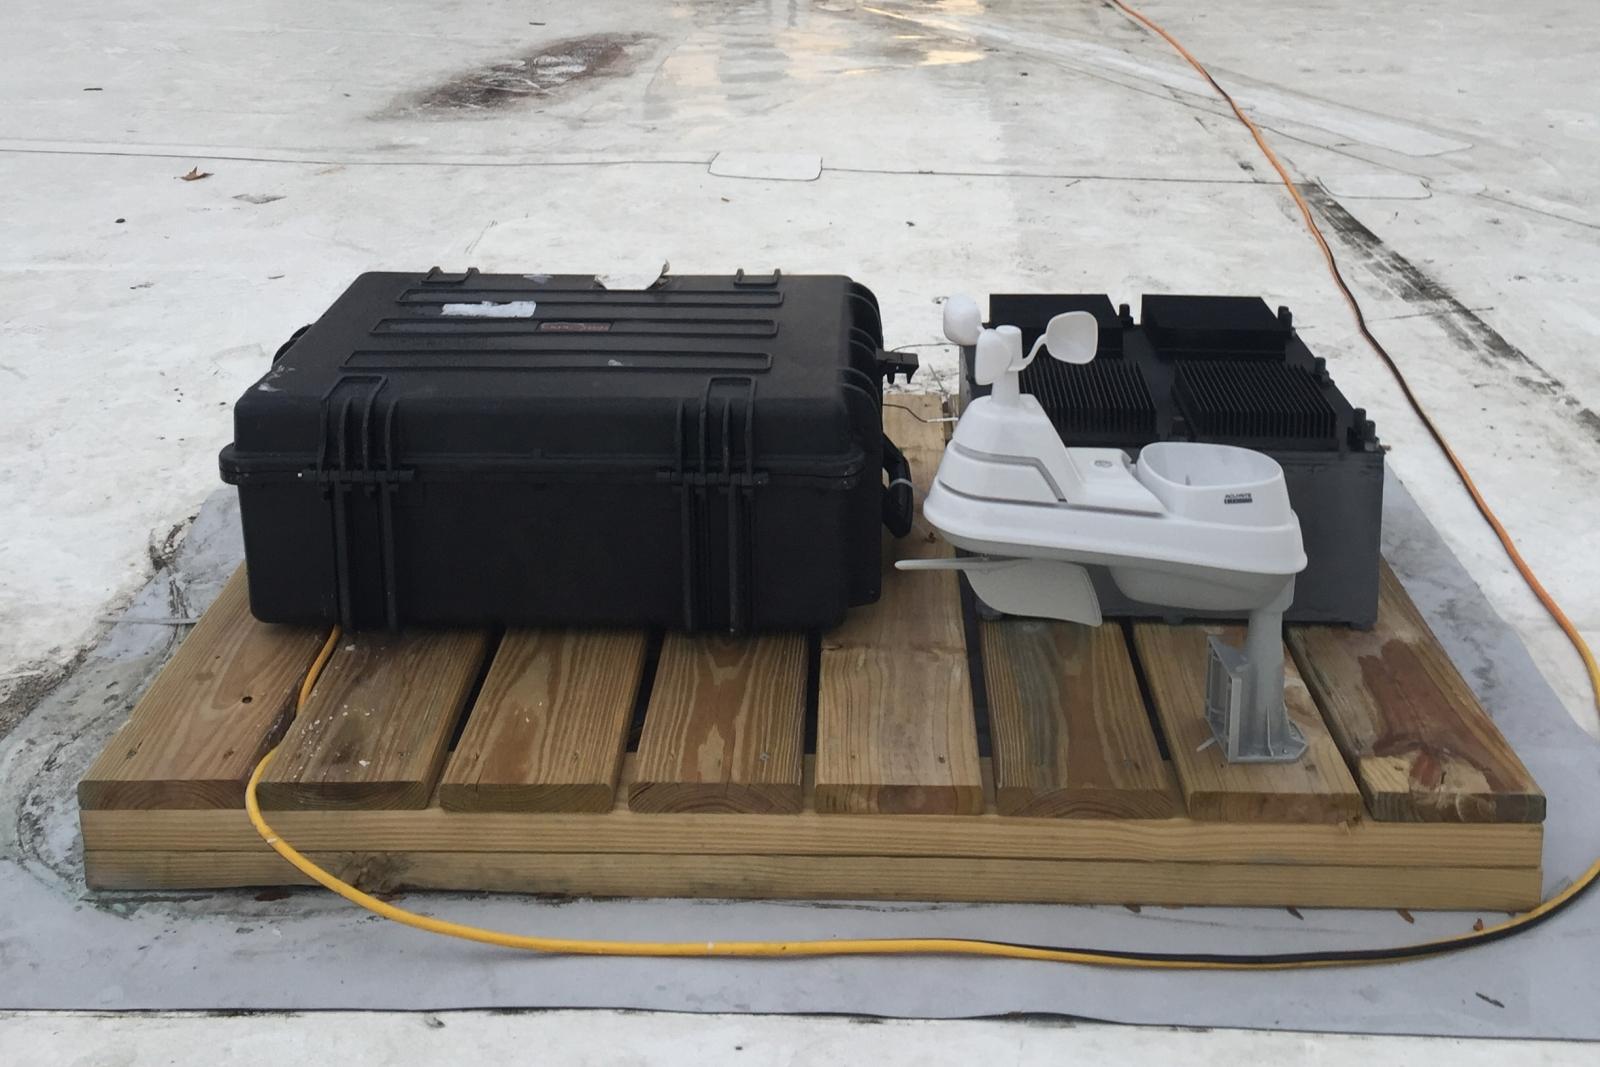 MIT engineers create energy generating device